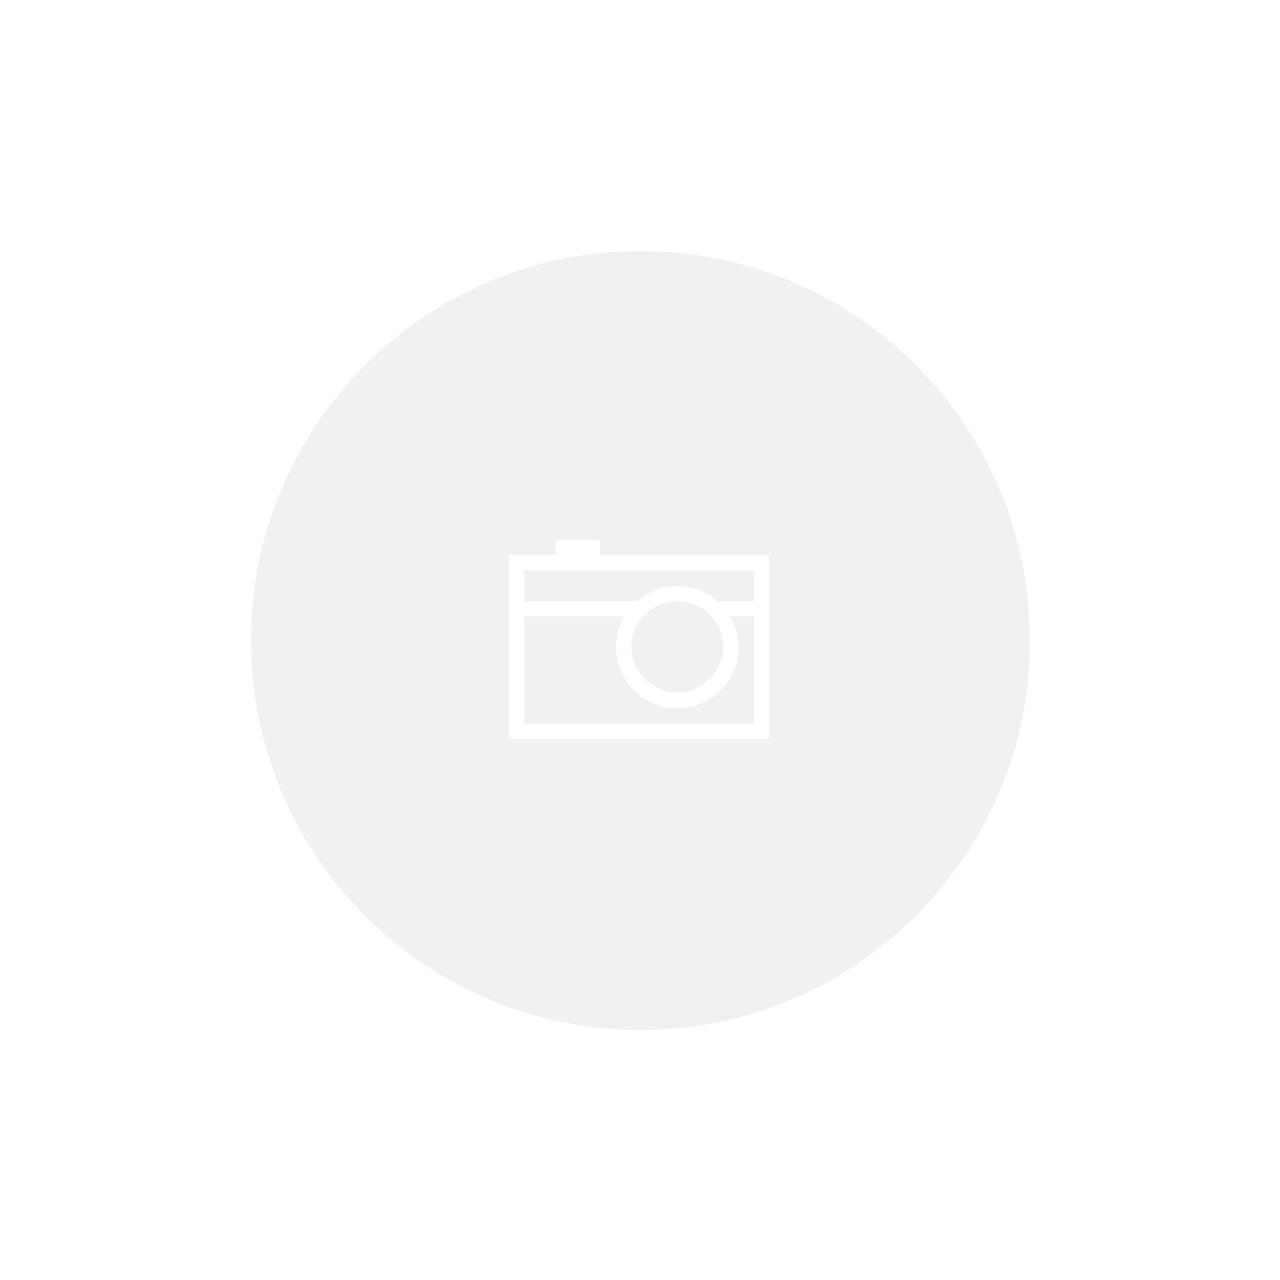 Papel Artesanal Indiano - Ref. 89